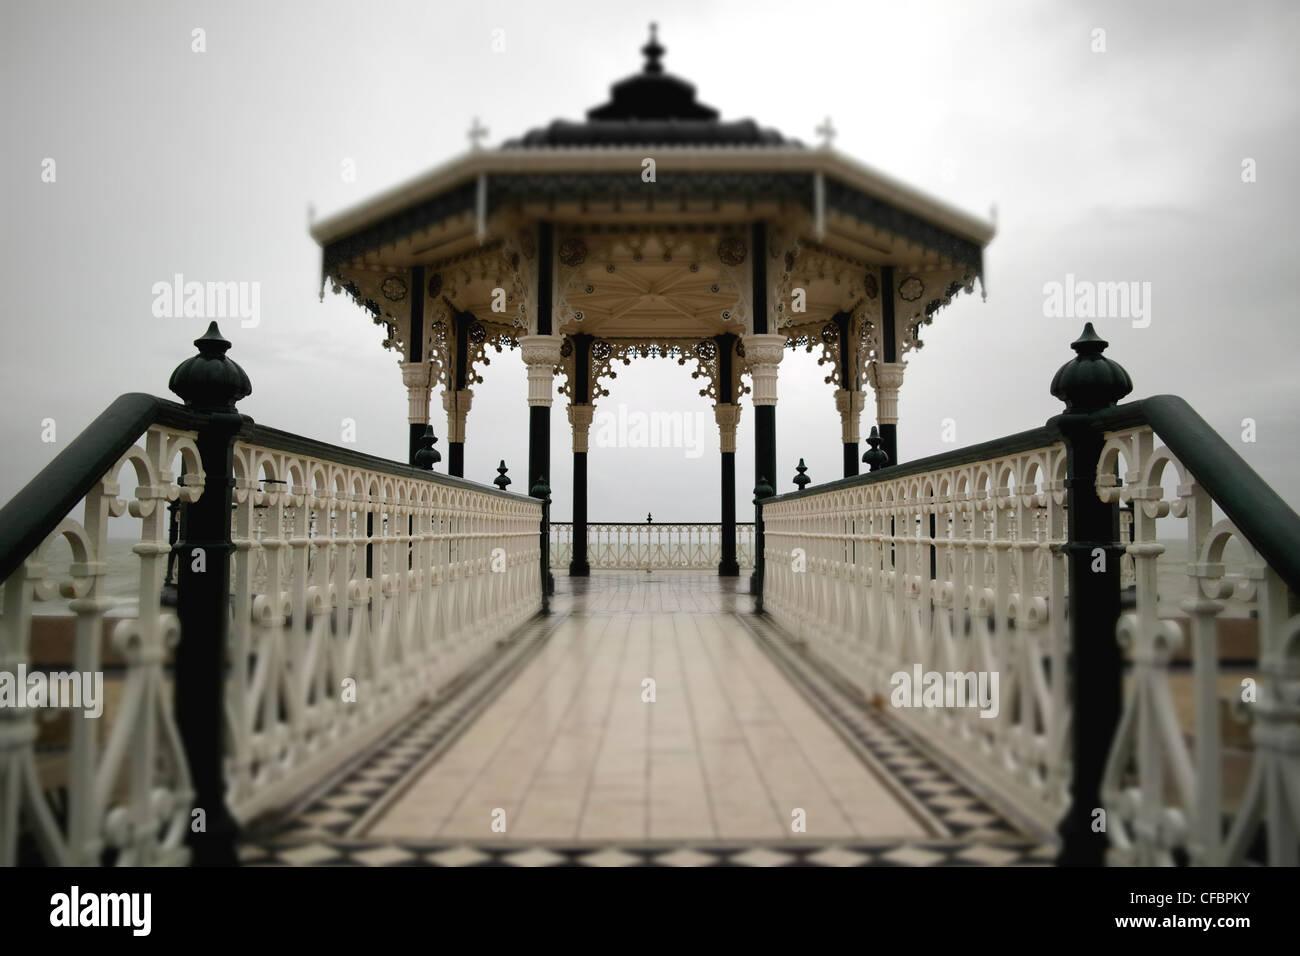 Brighton bandstand, Brighton, East Sussex, England, UK, January, 2012 - Stock Image